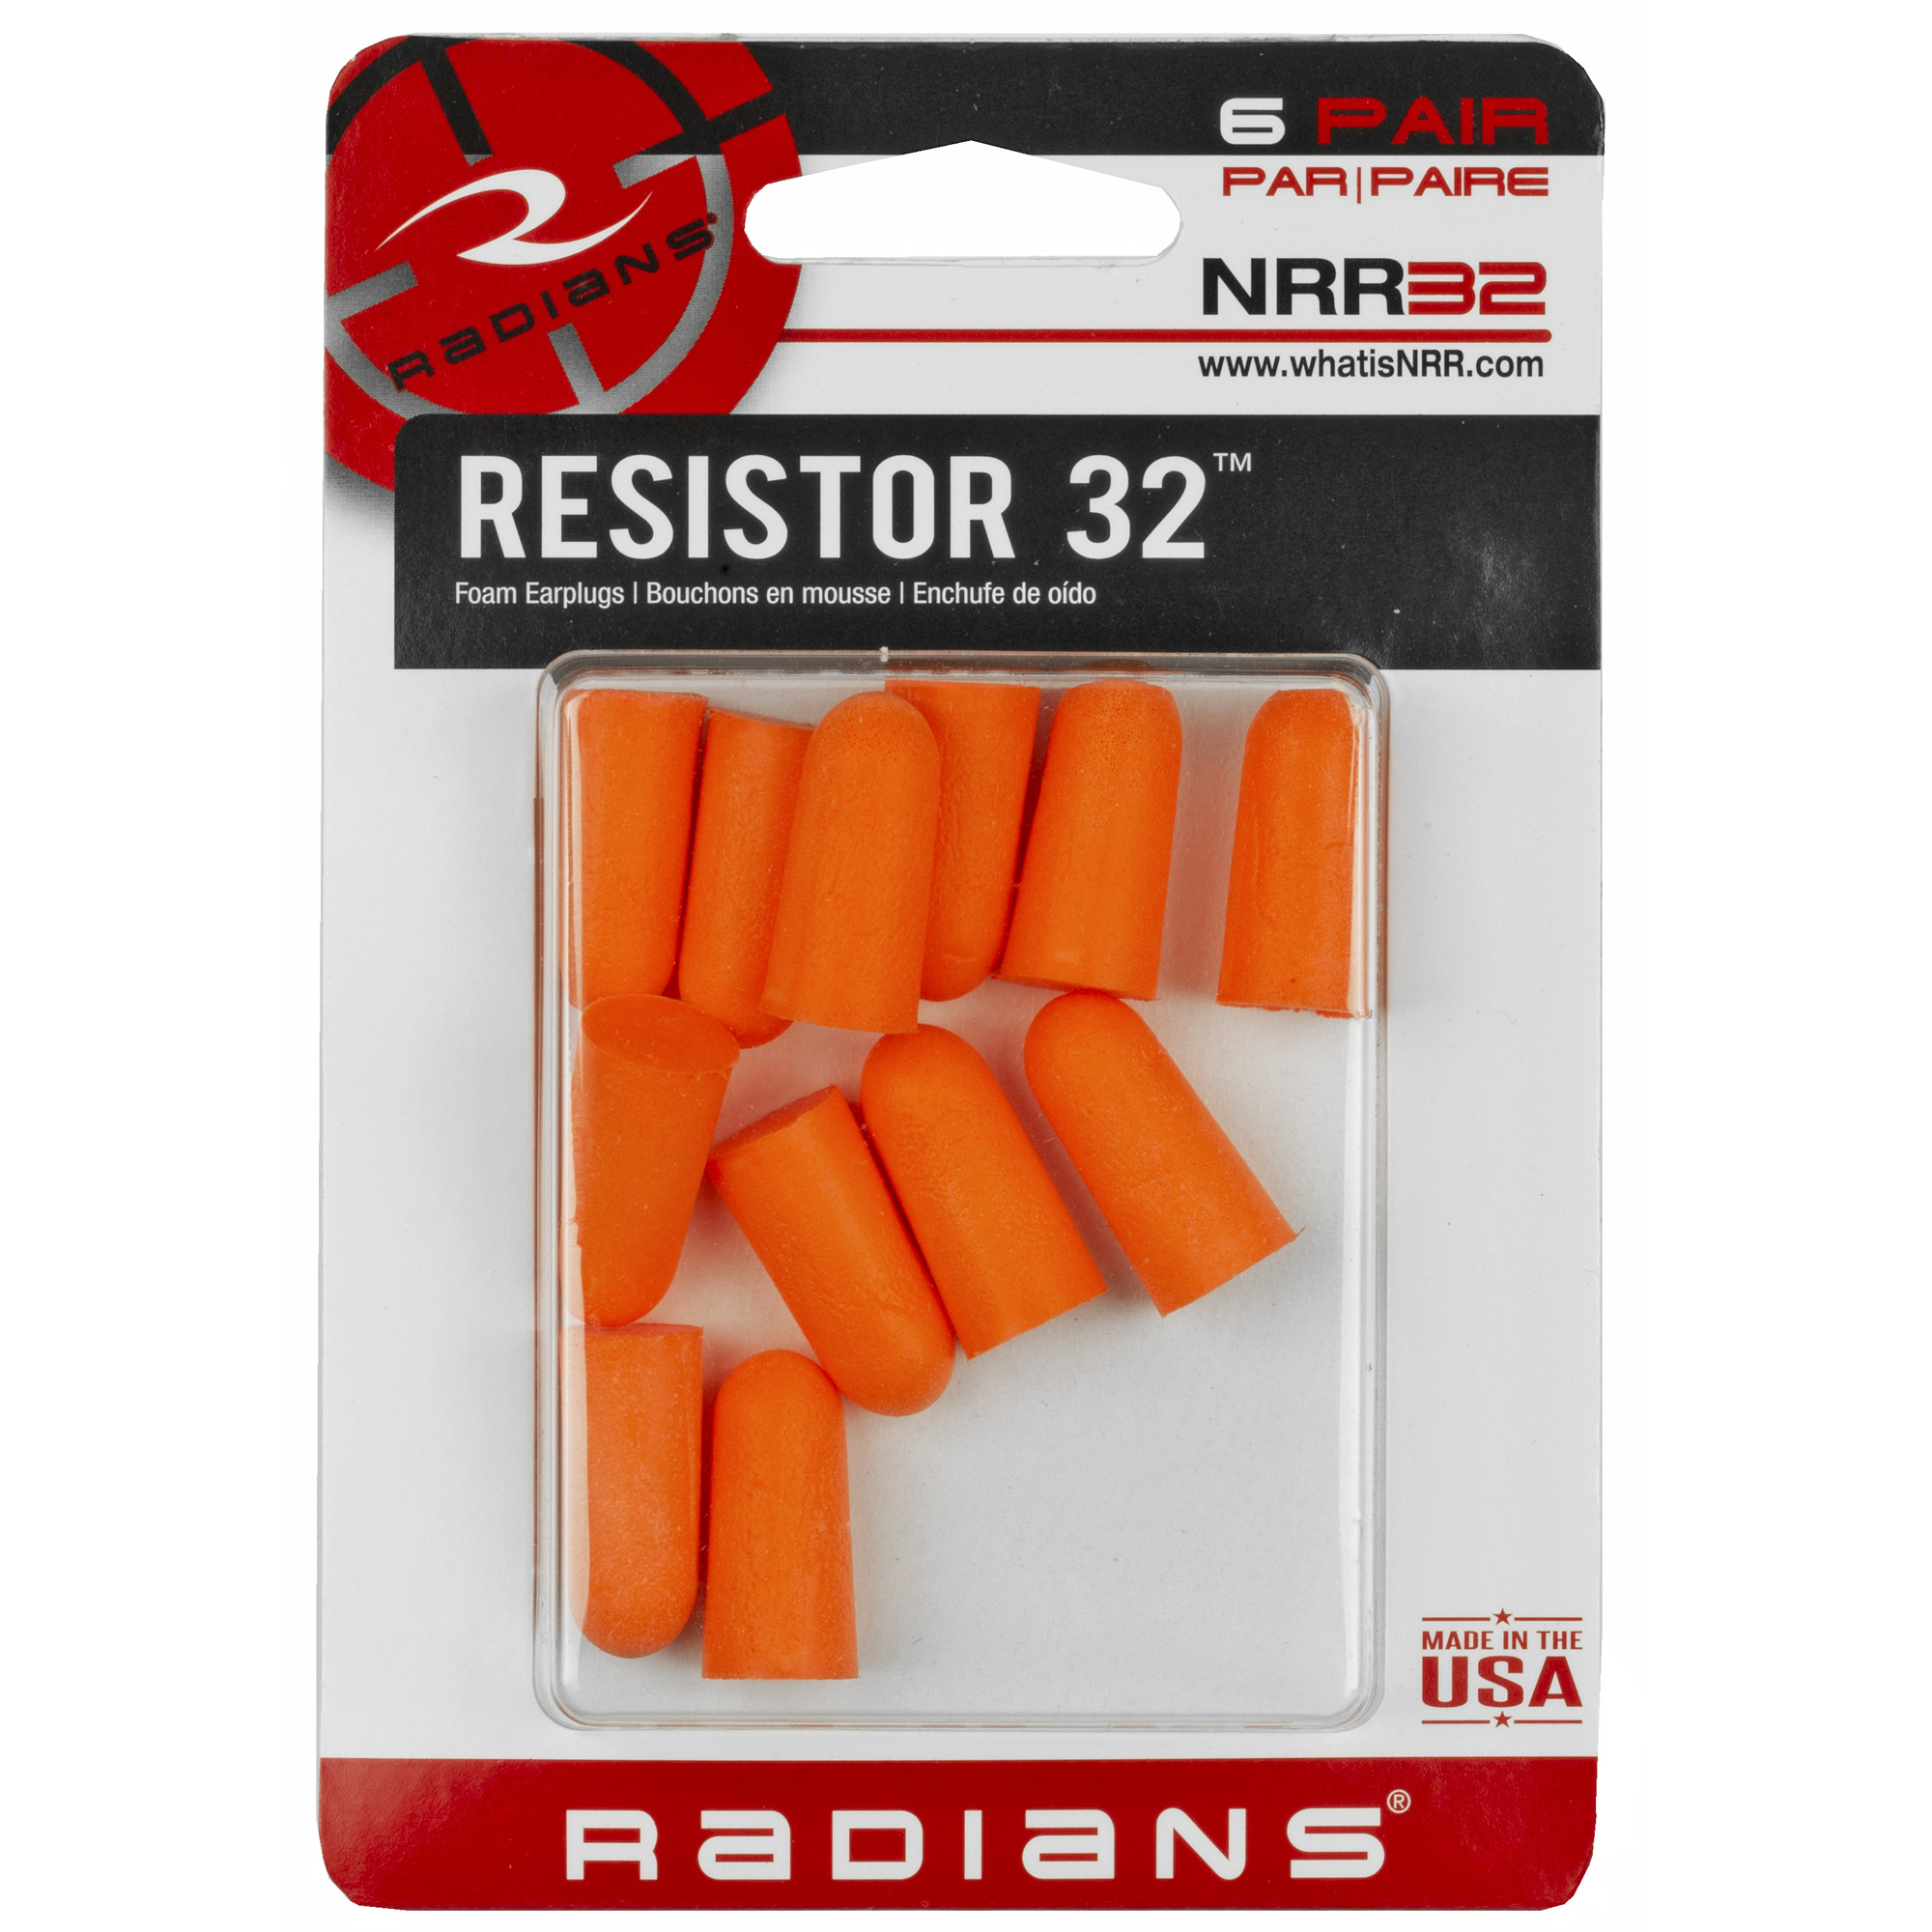 Radians Resistor Earplug 6 Pairs